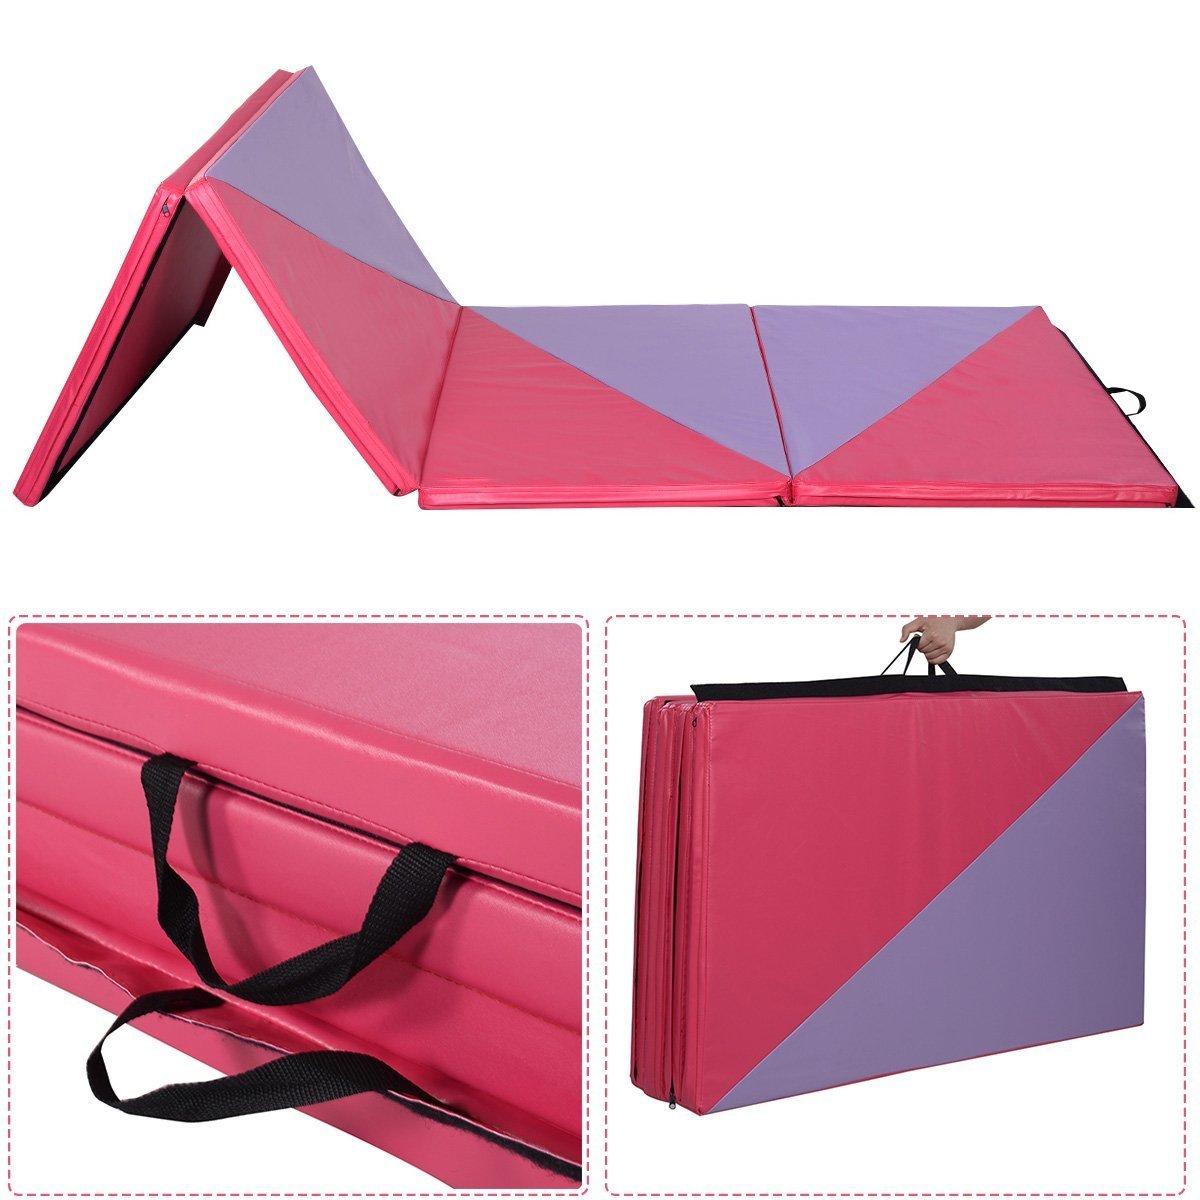 ZENOVA Thick Folding Gymnastics Mat 4x10//4x12 Large Home Aerobics Exercise Gym Mat Girls Indoor Fitness